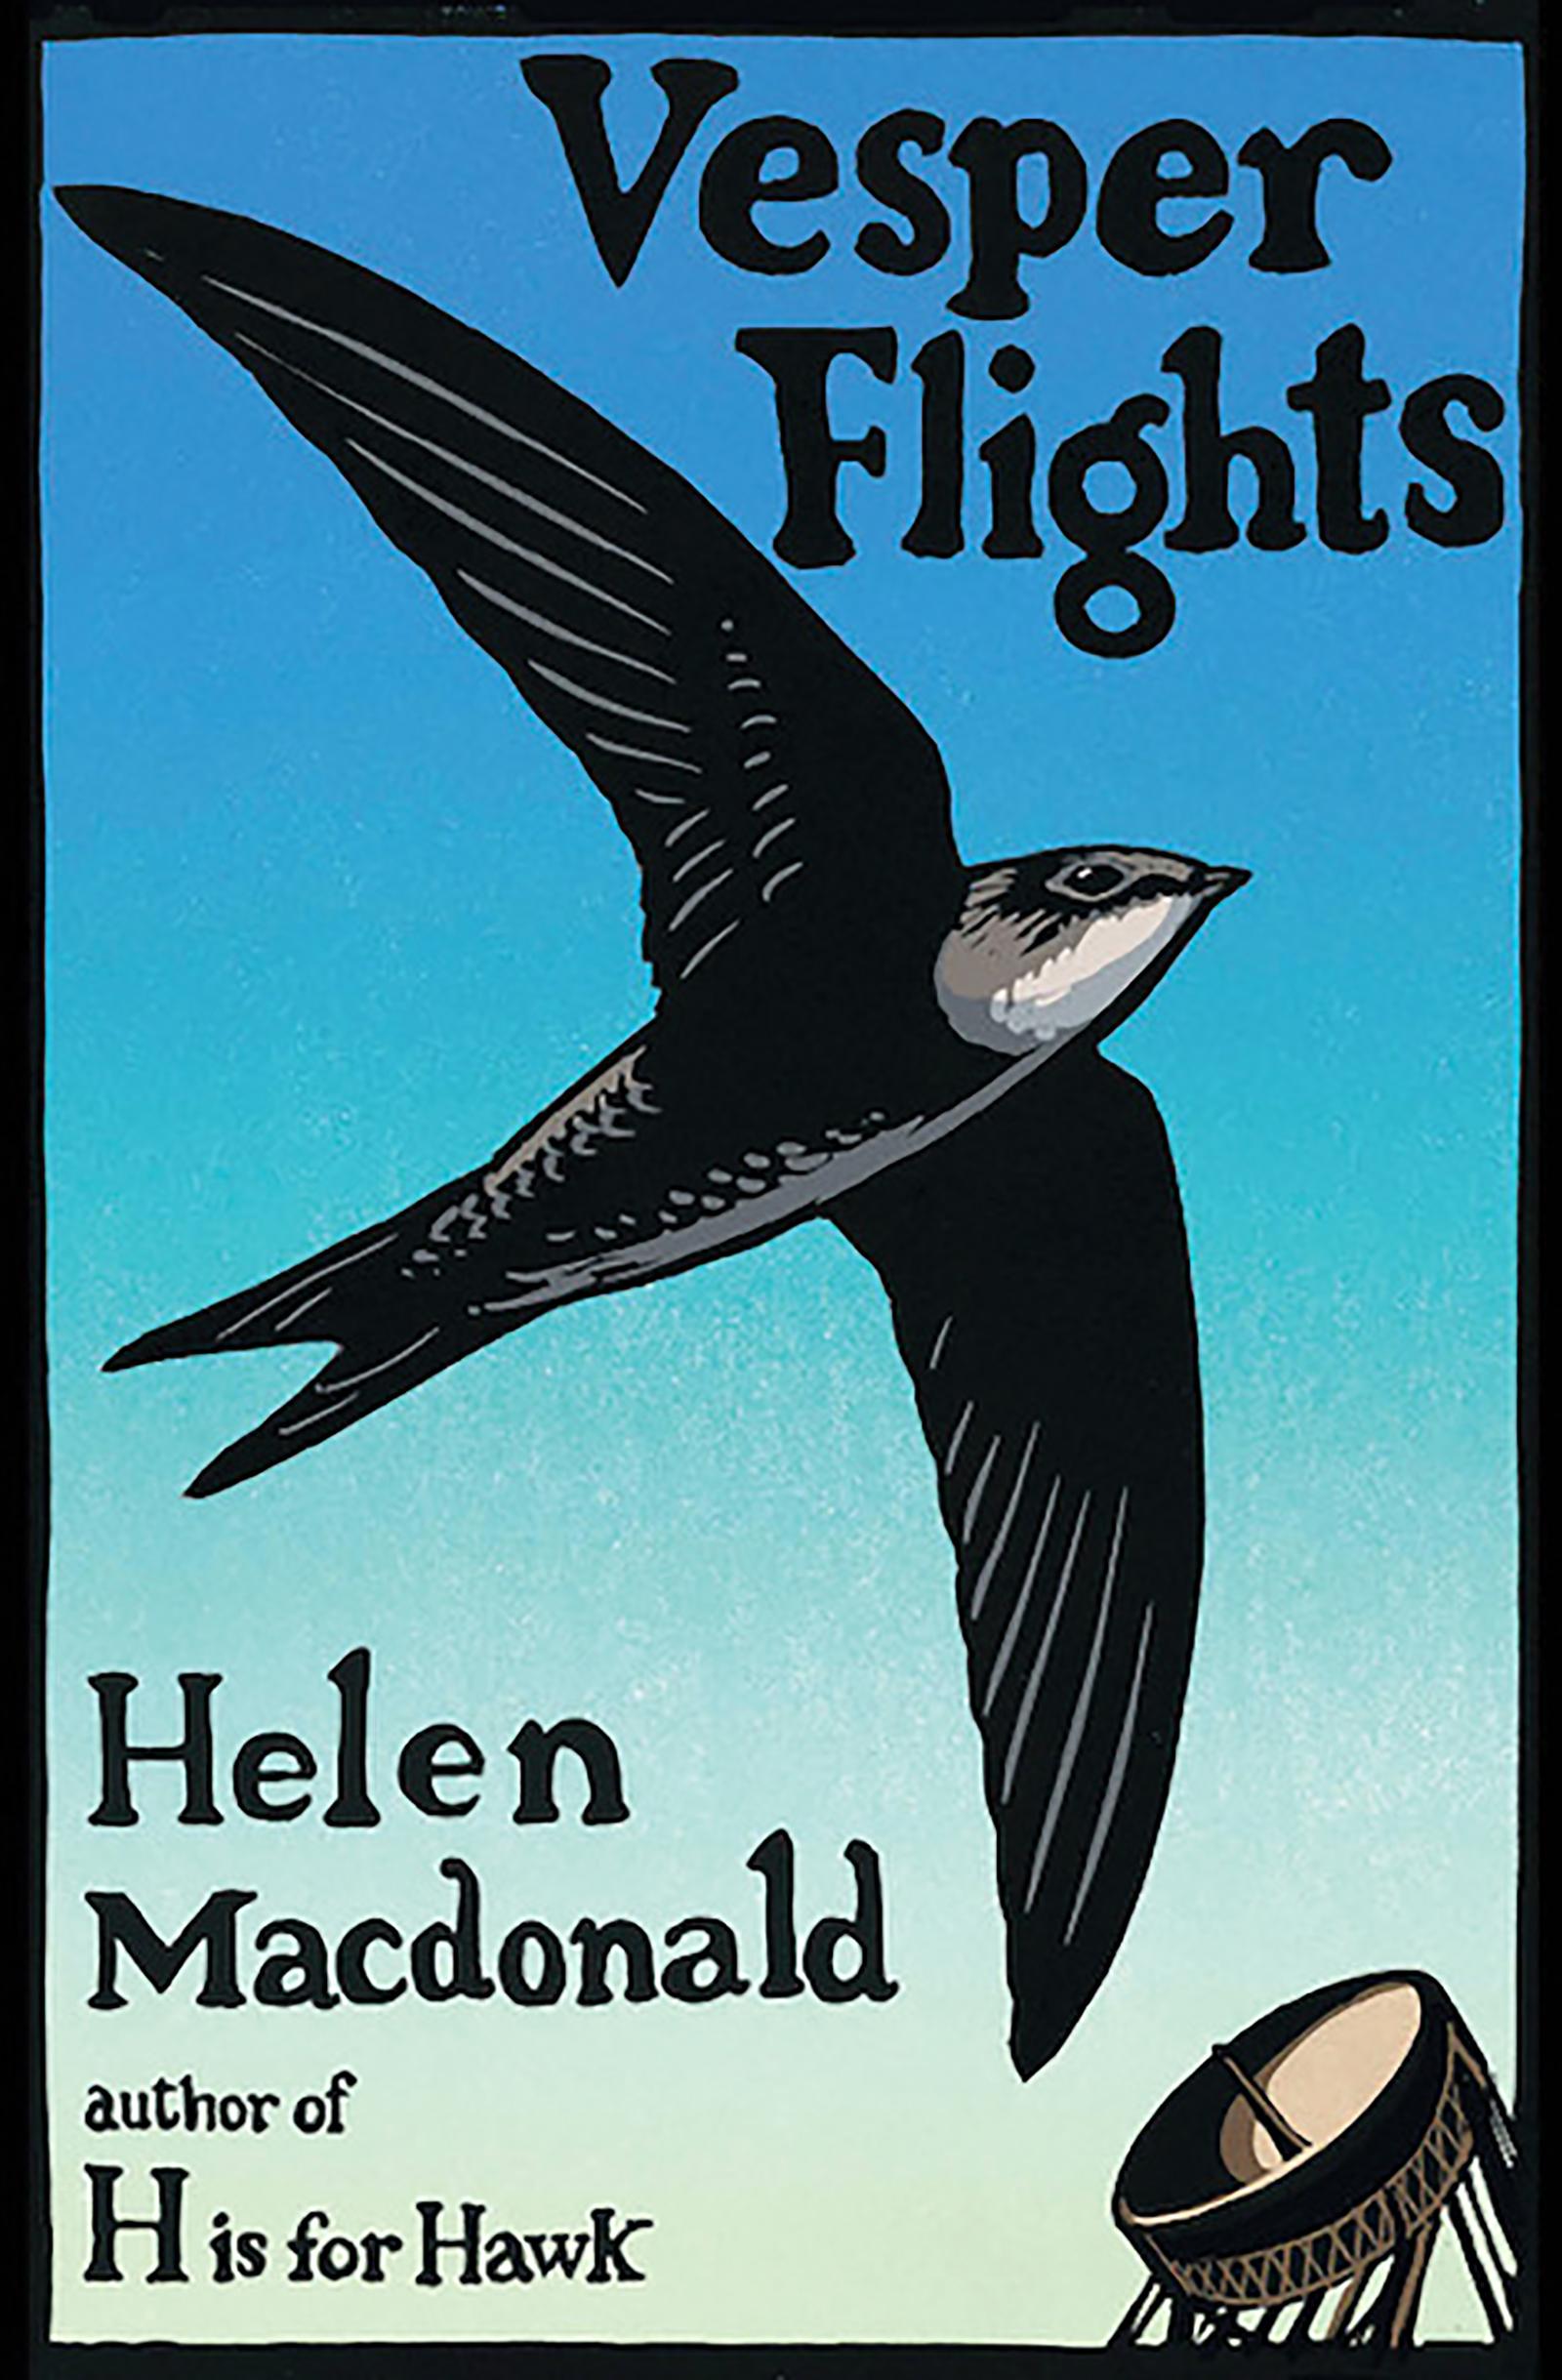 Vesper Flights by Helen Macdonald (Grove Press)